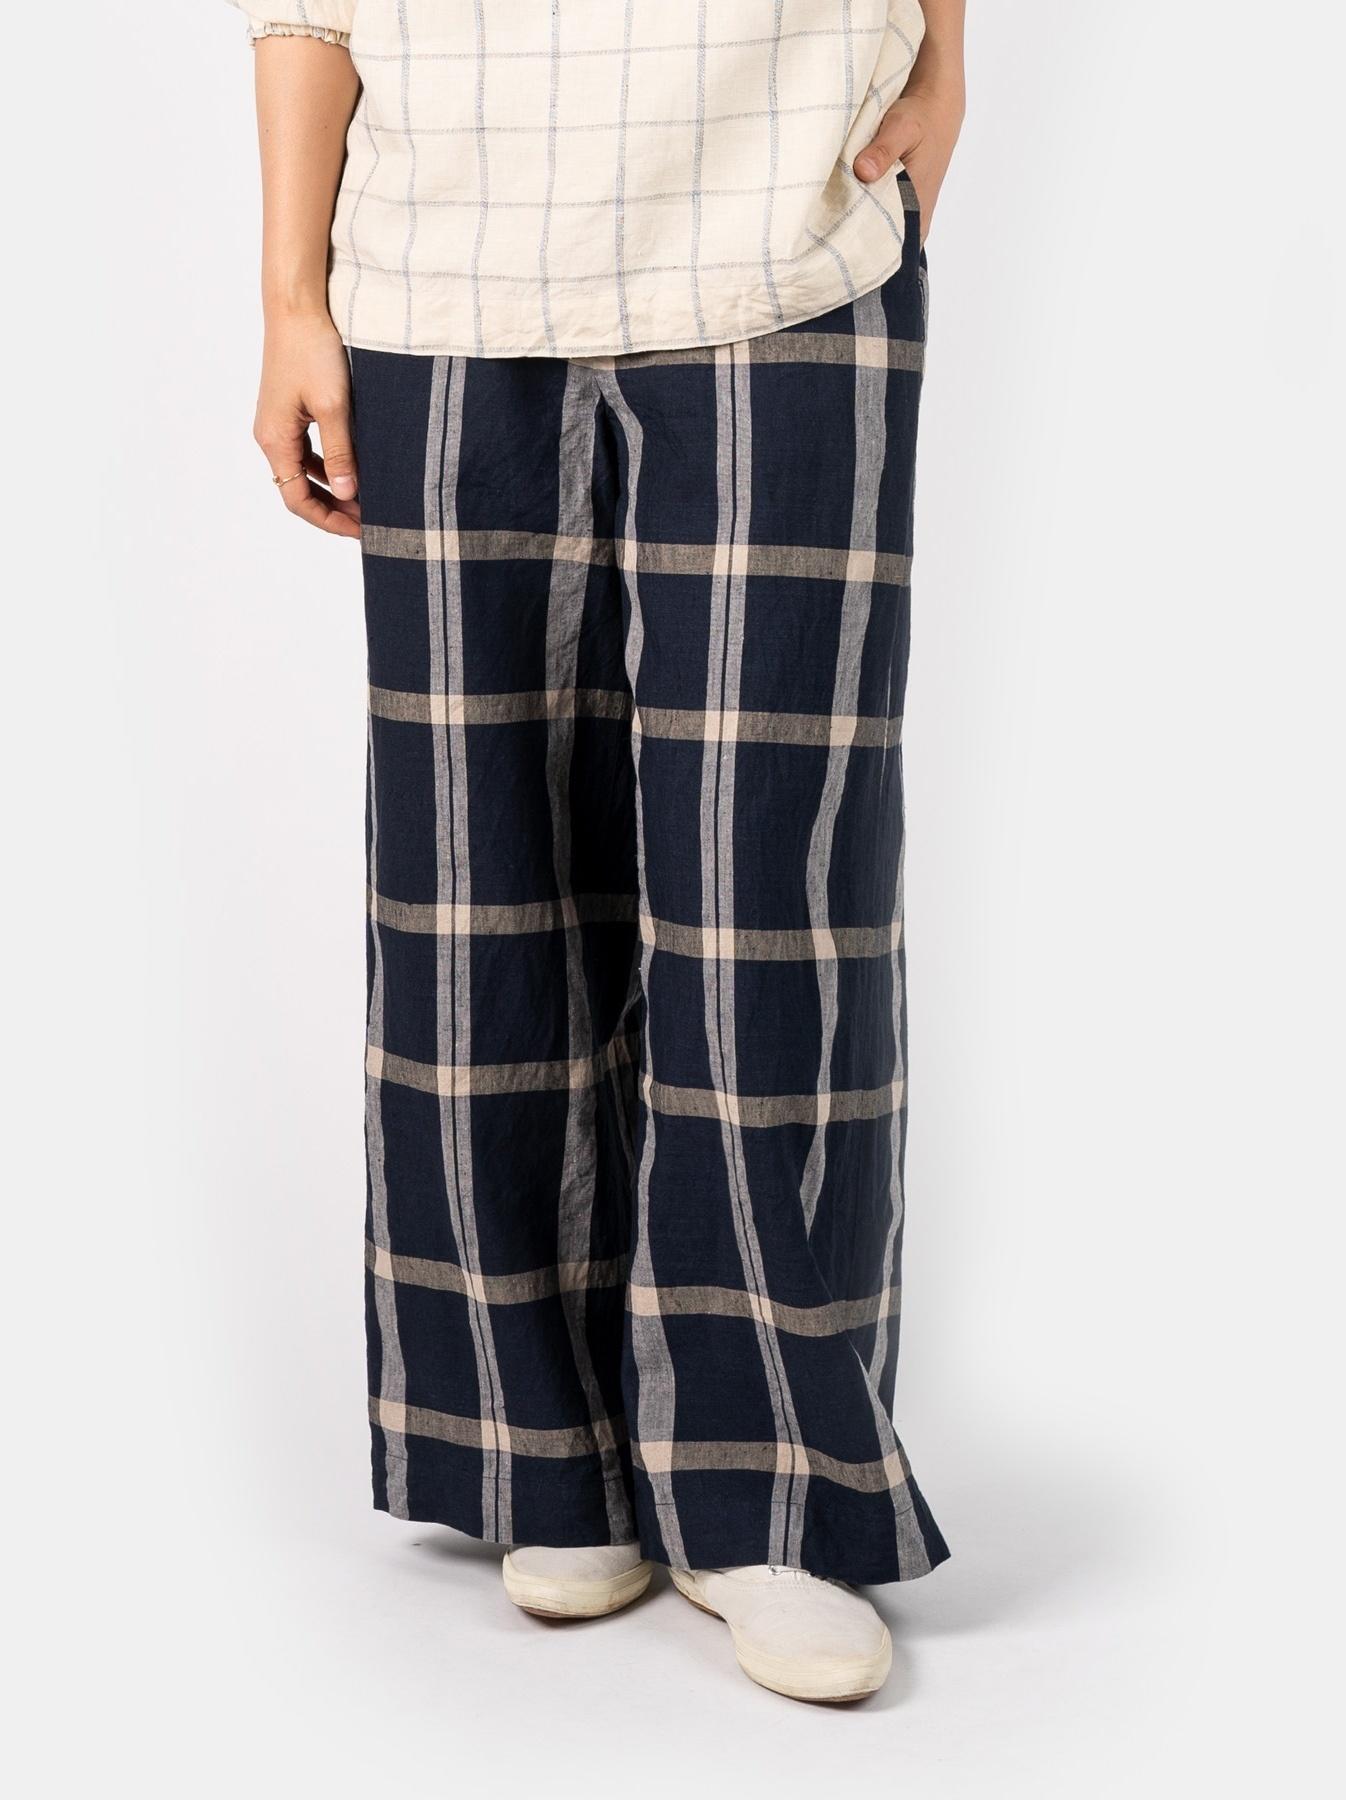 WH Linen 4545 Check Pants-3